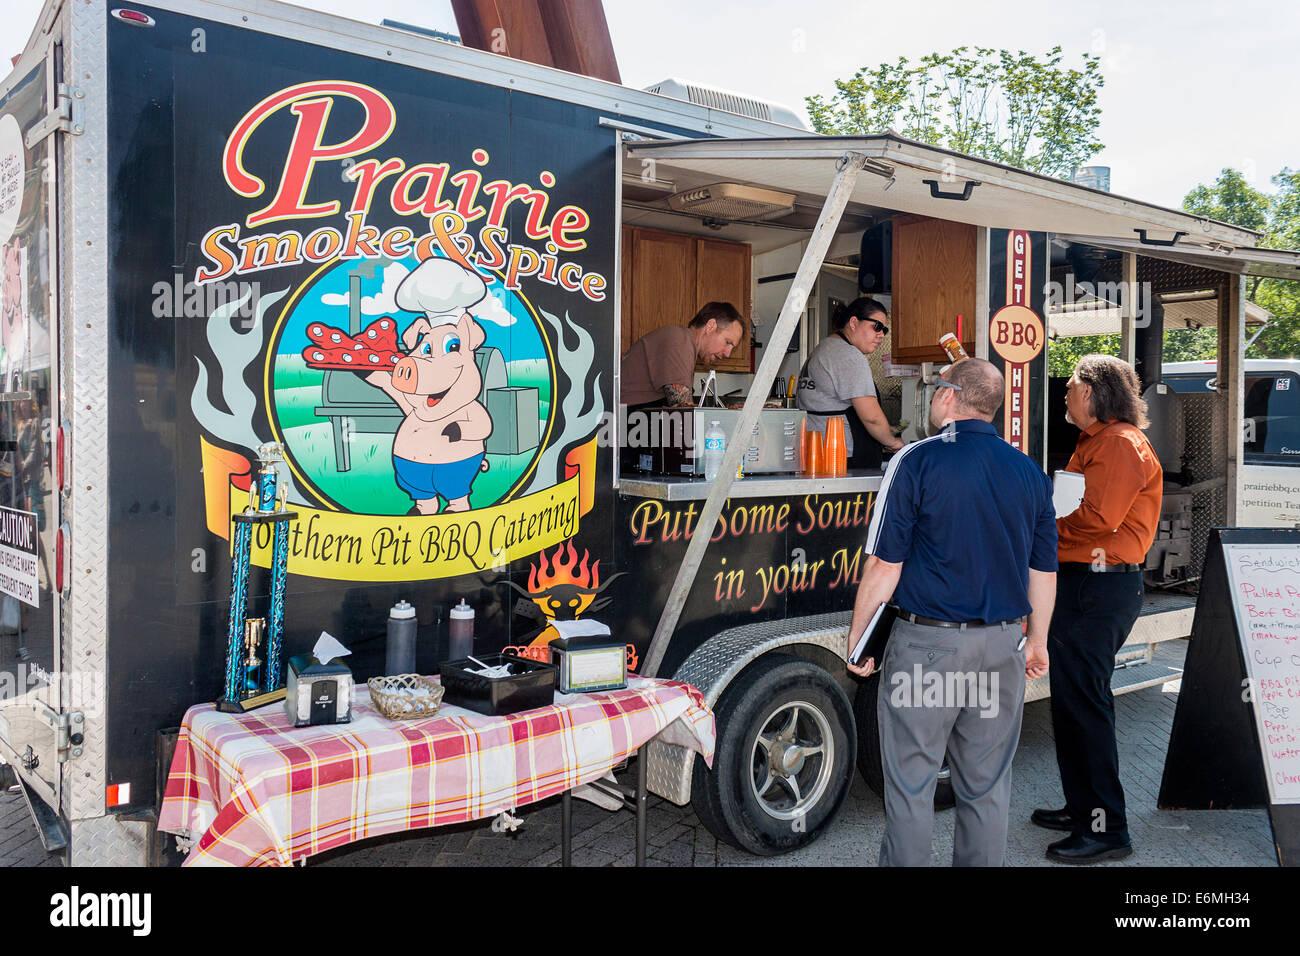 BBQ food truck, Prairie Smoke & Spice at Regina's twice weekly farmer's market, Regina, Saskatchewan, - Stock Image